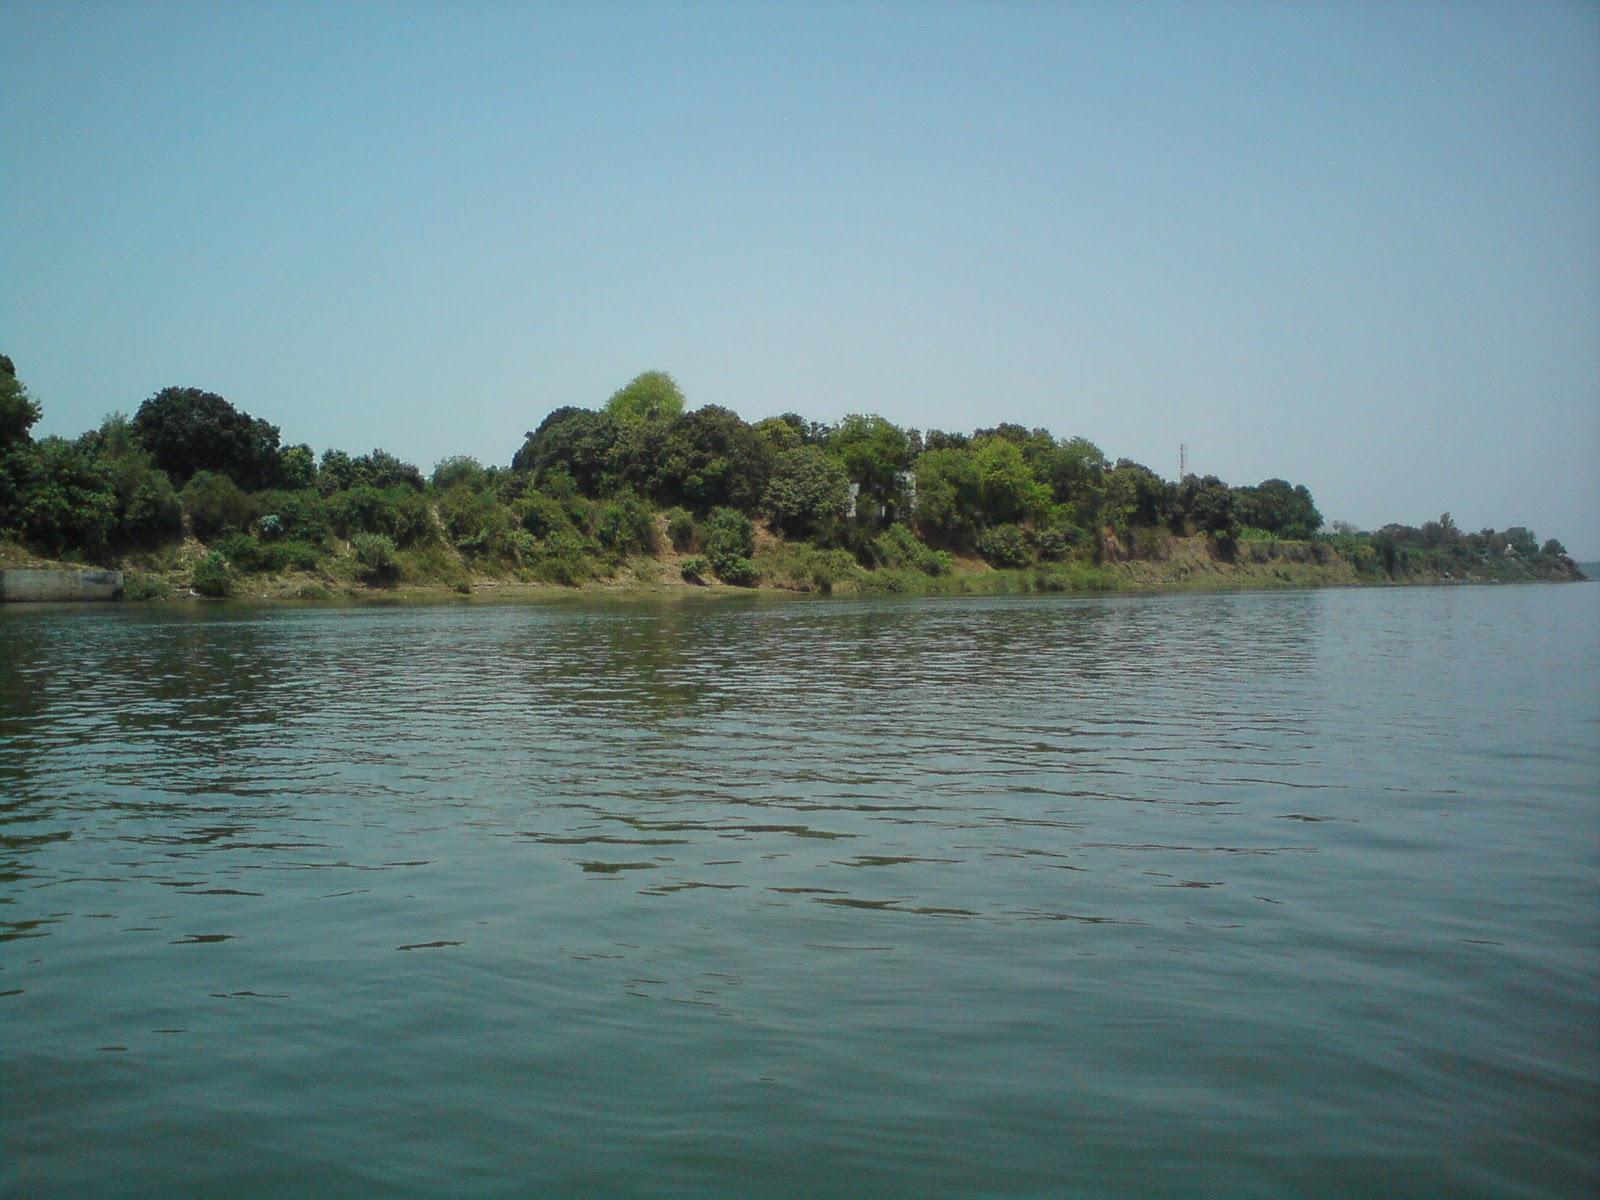 On the banks of River Narmada - Shuklatirth | My Yatra ...